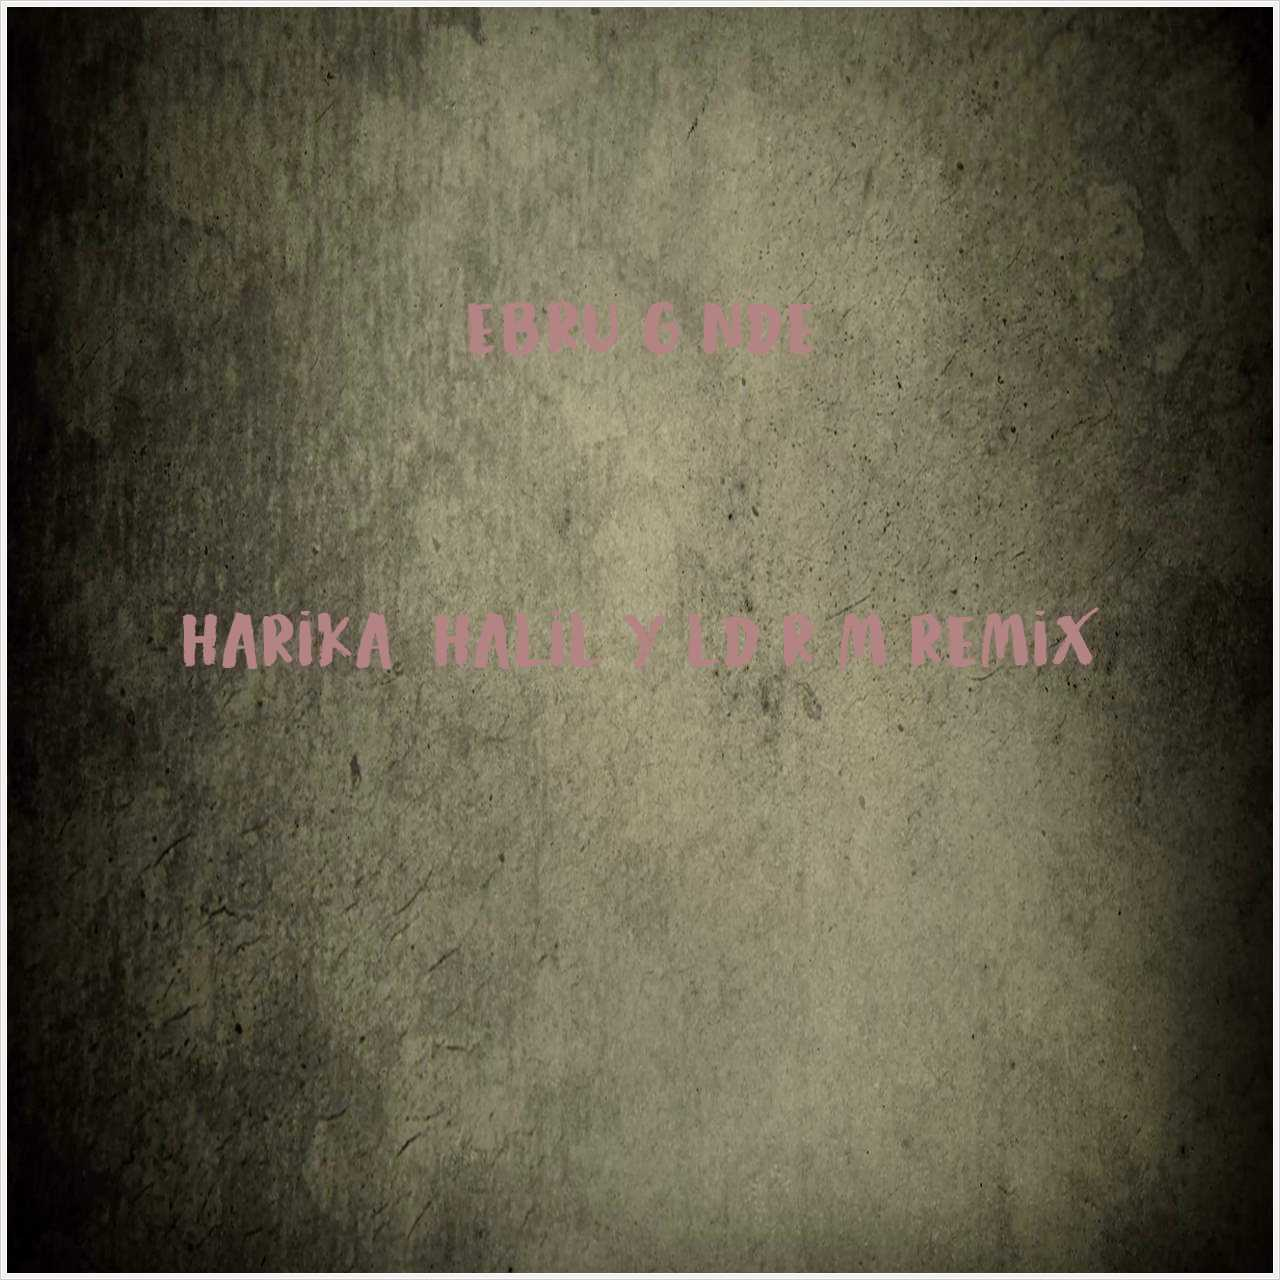 دانلود آهنگ جدید Ebru Gündeş به نام Harika (Halil Yıldırım Remix)